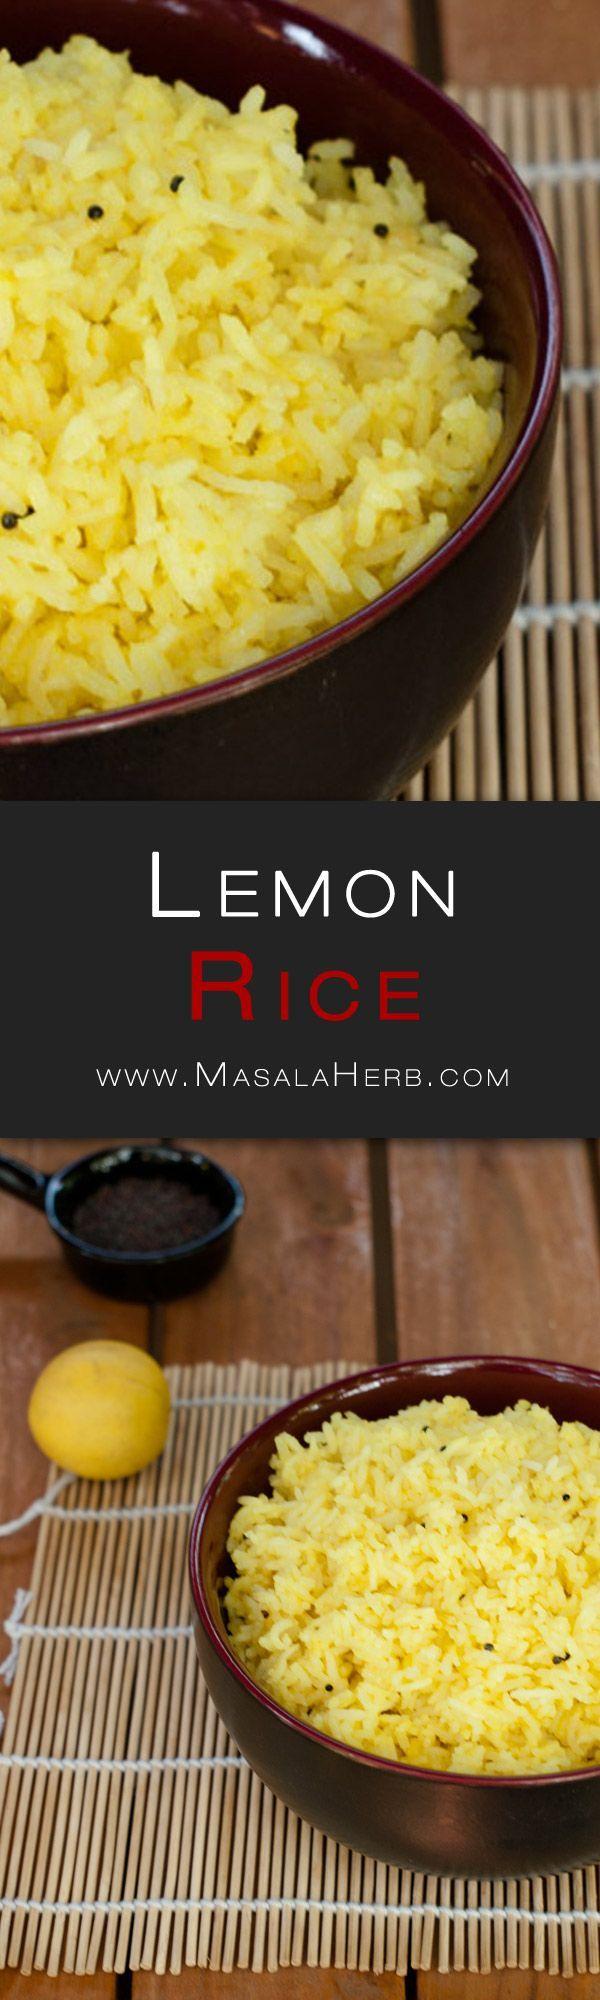 Lemon Rice Recipe - How to make Lemon Rice www.MasalaHerb.com #Recipe #Indianfood #spiced